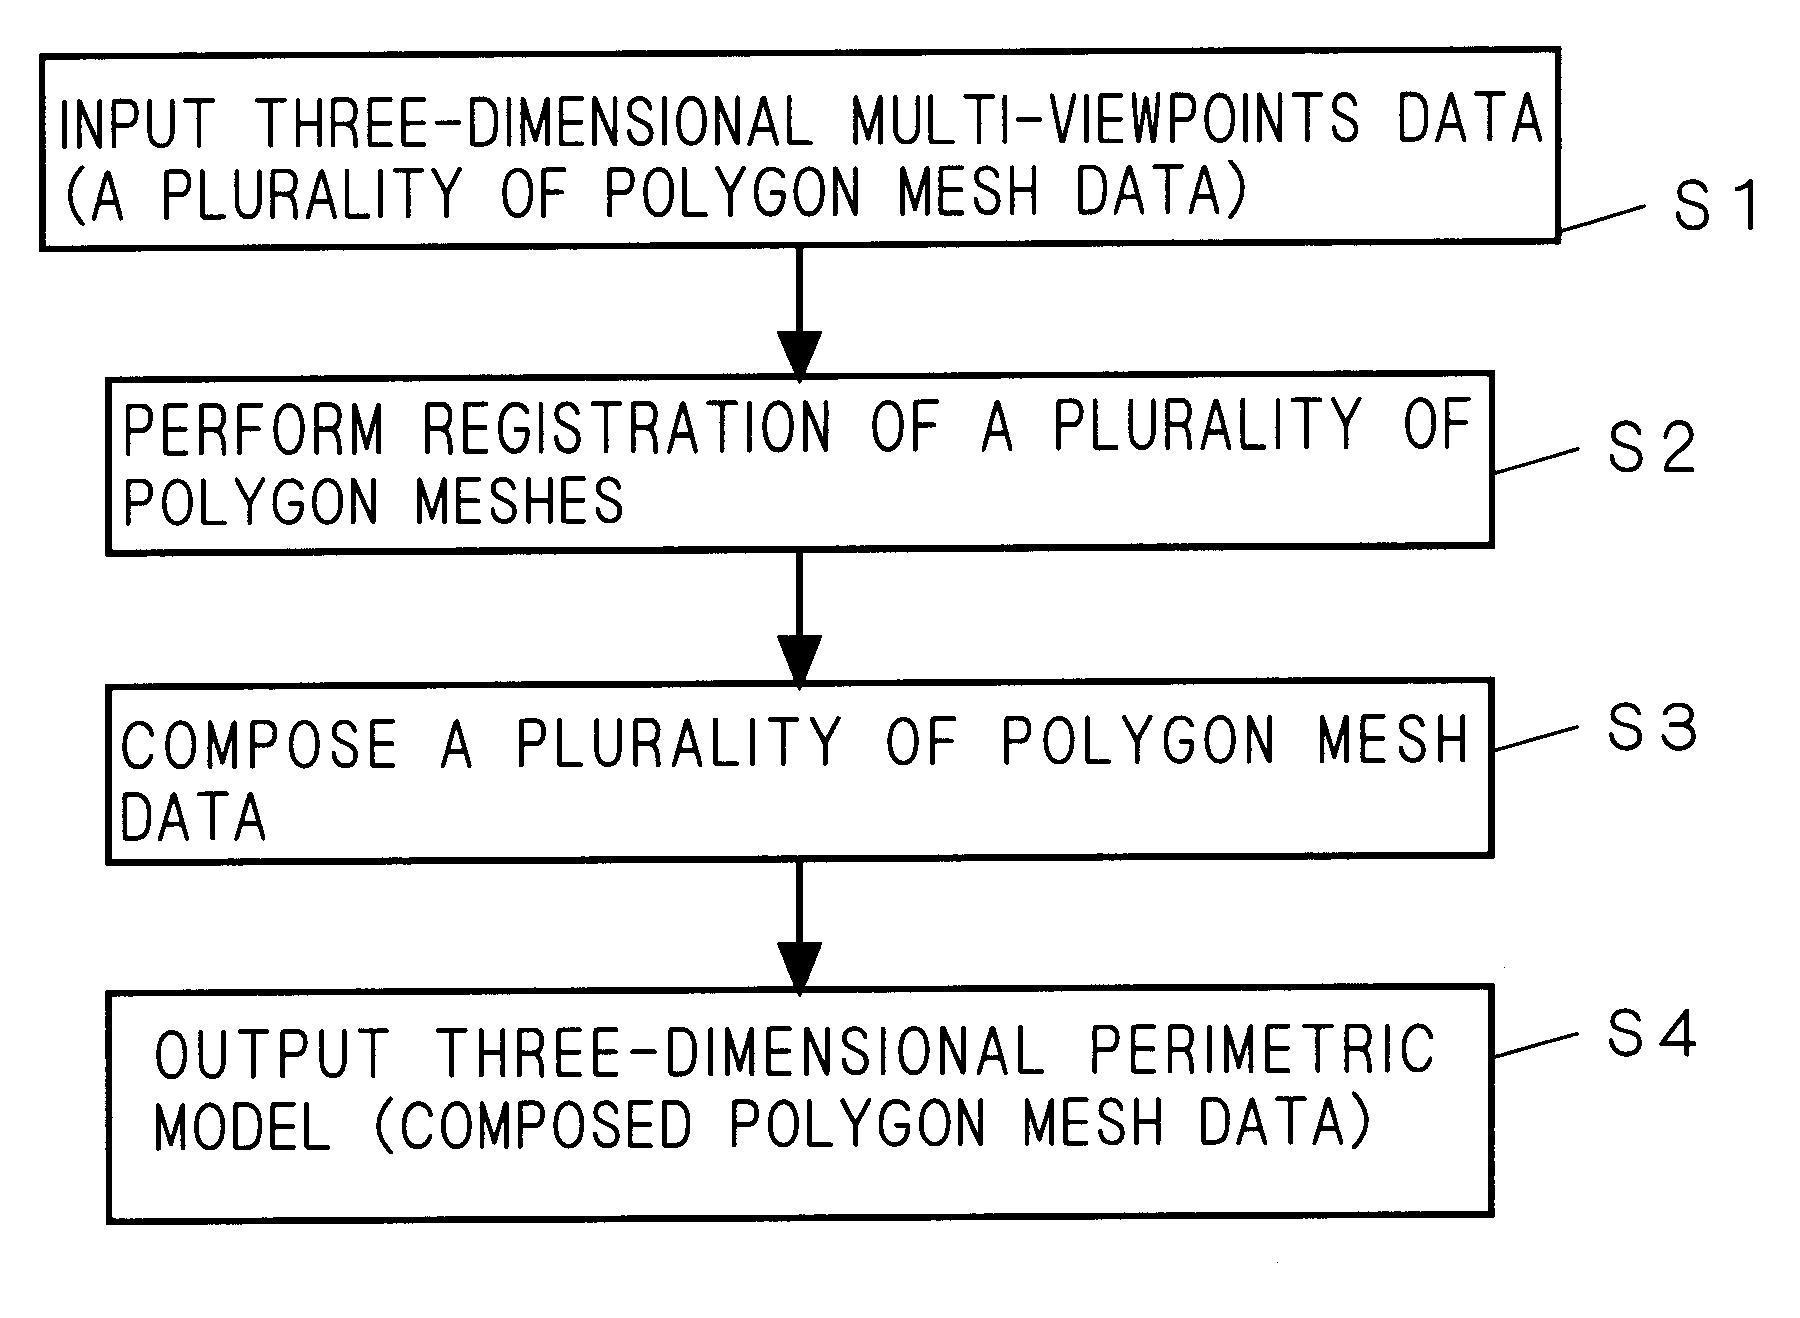 Patent US Method of posing three dimensional multi